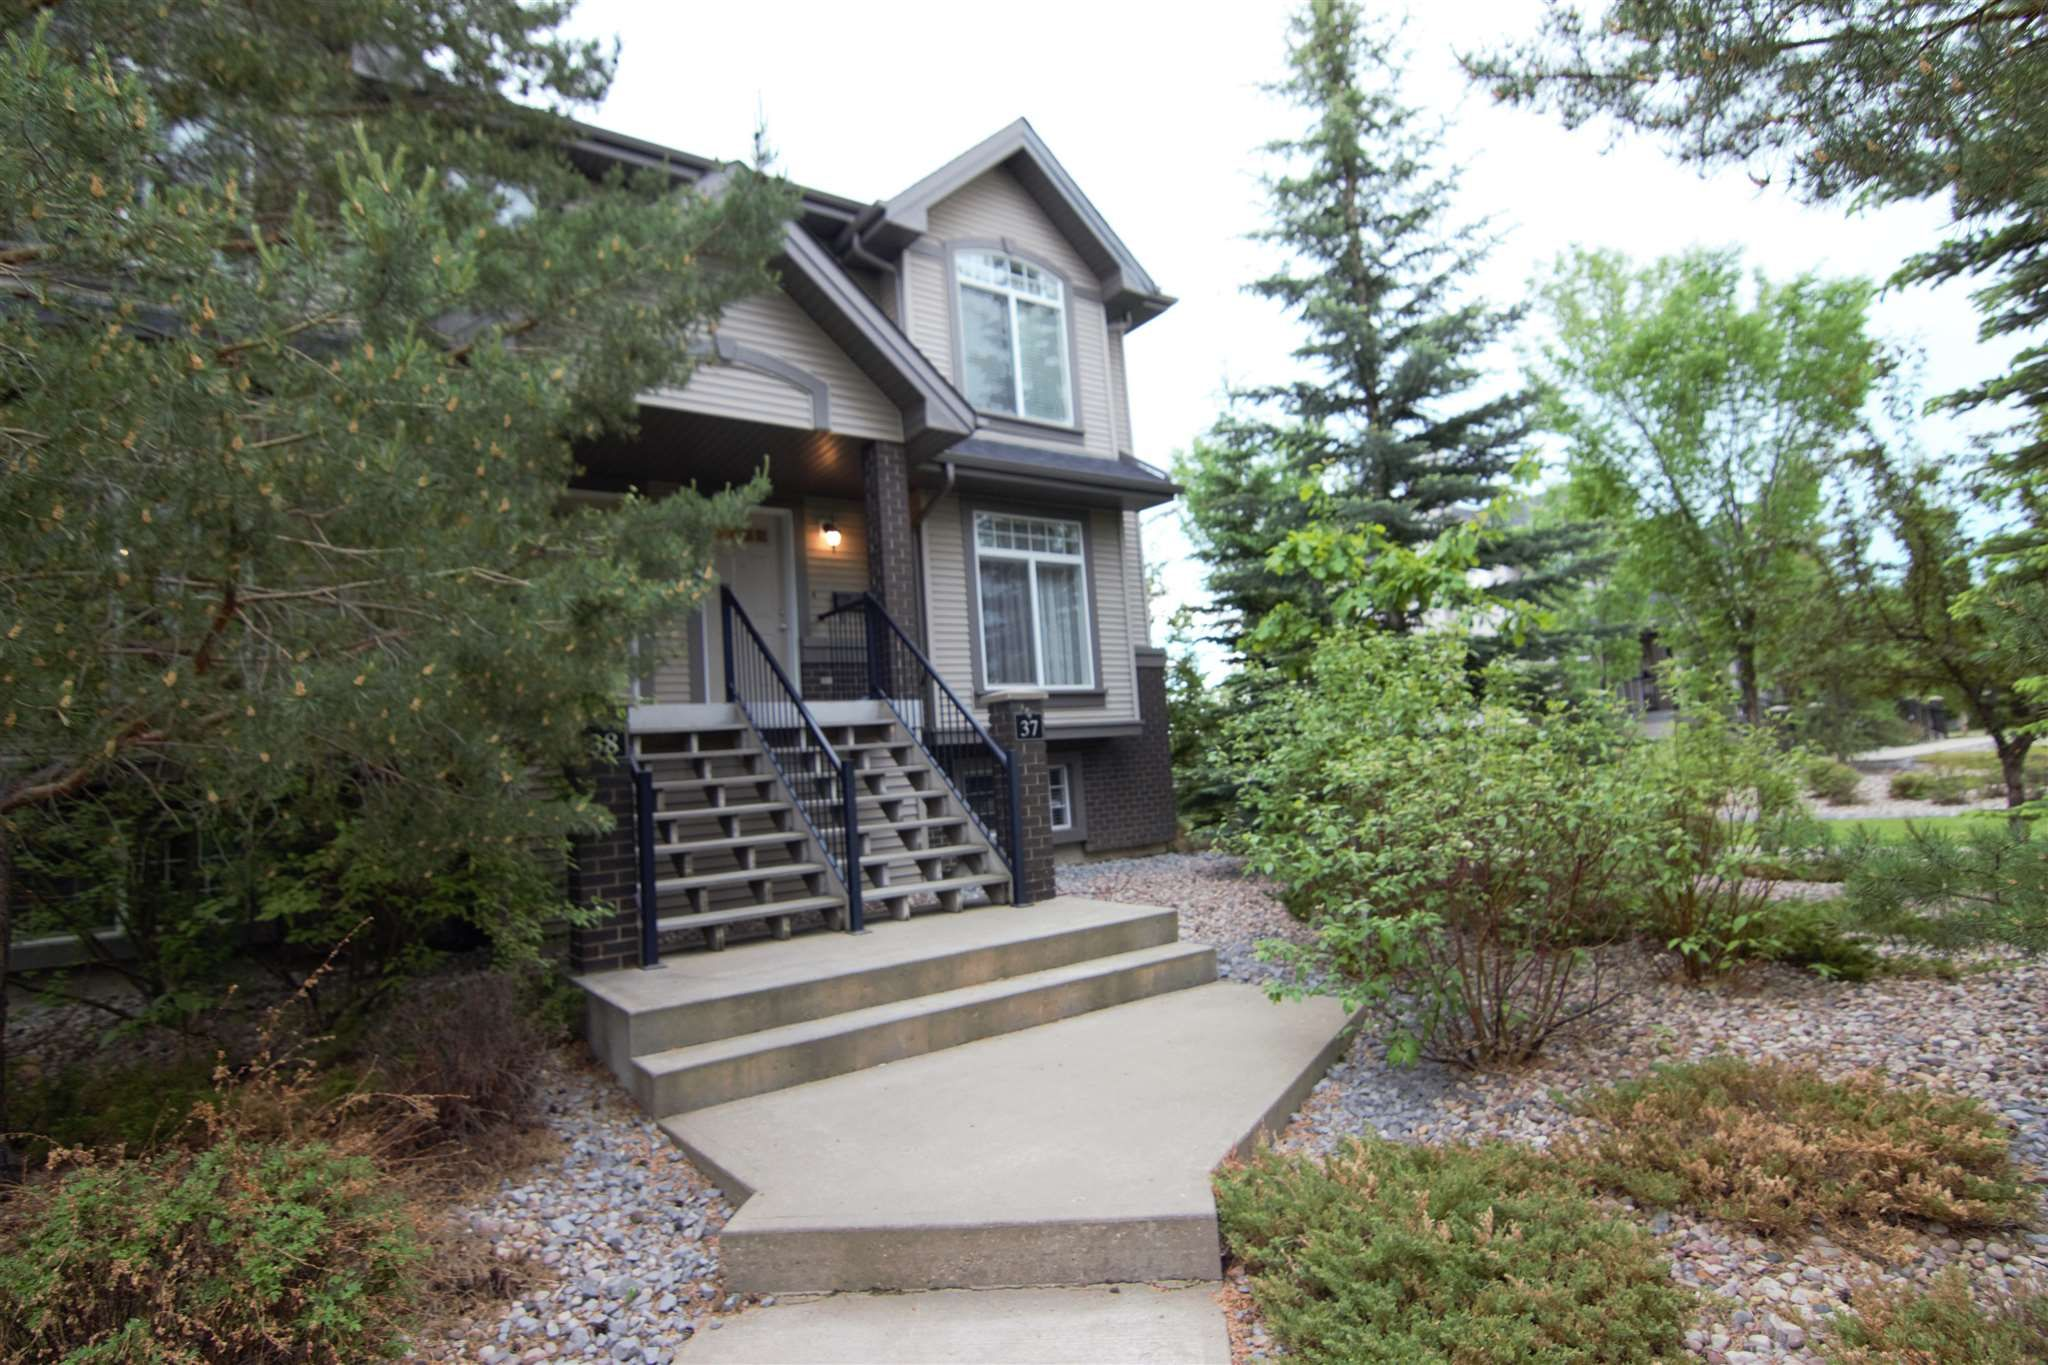 Main Photo: 37 4731 TERWILLEGAR Common in Edmonton: Zone 14 Townhouse for sale : MLS®# E4249713